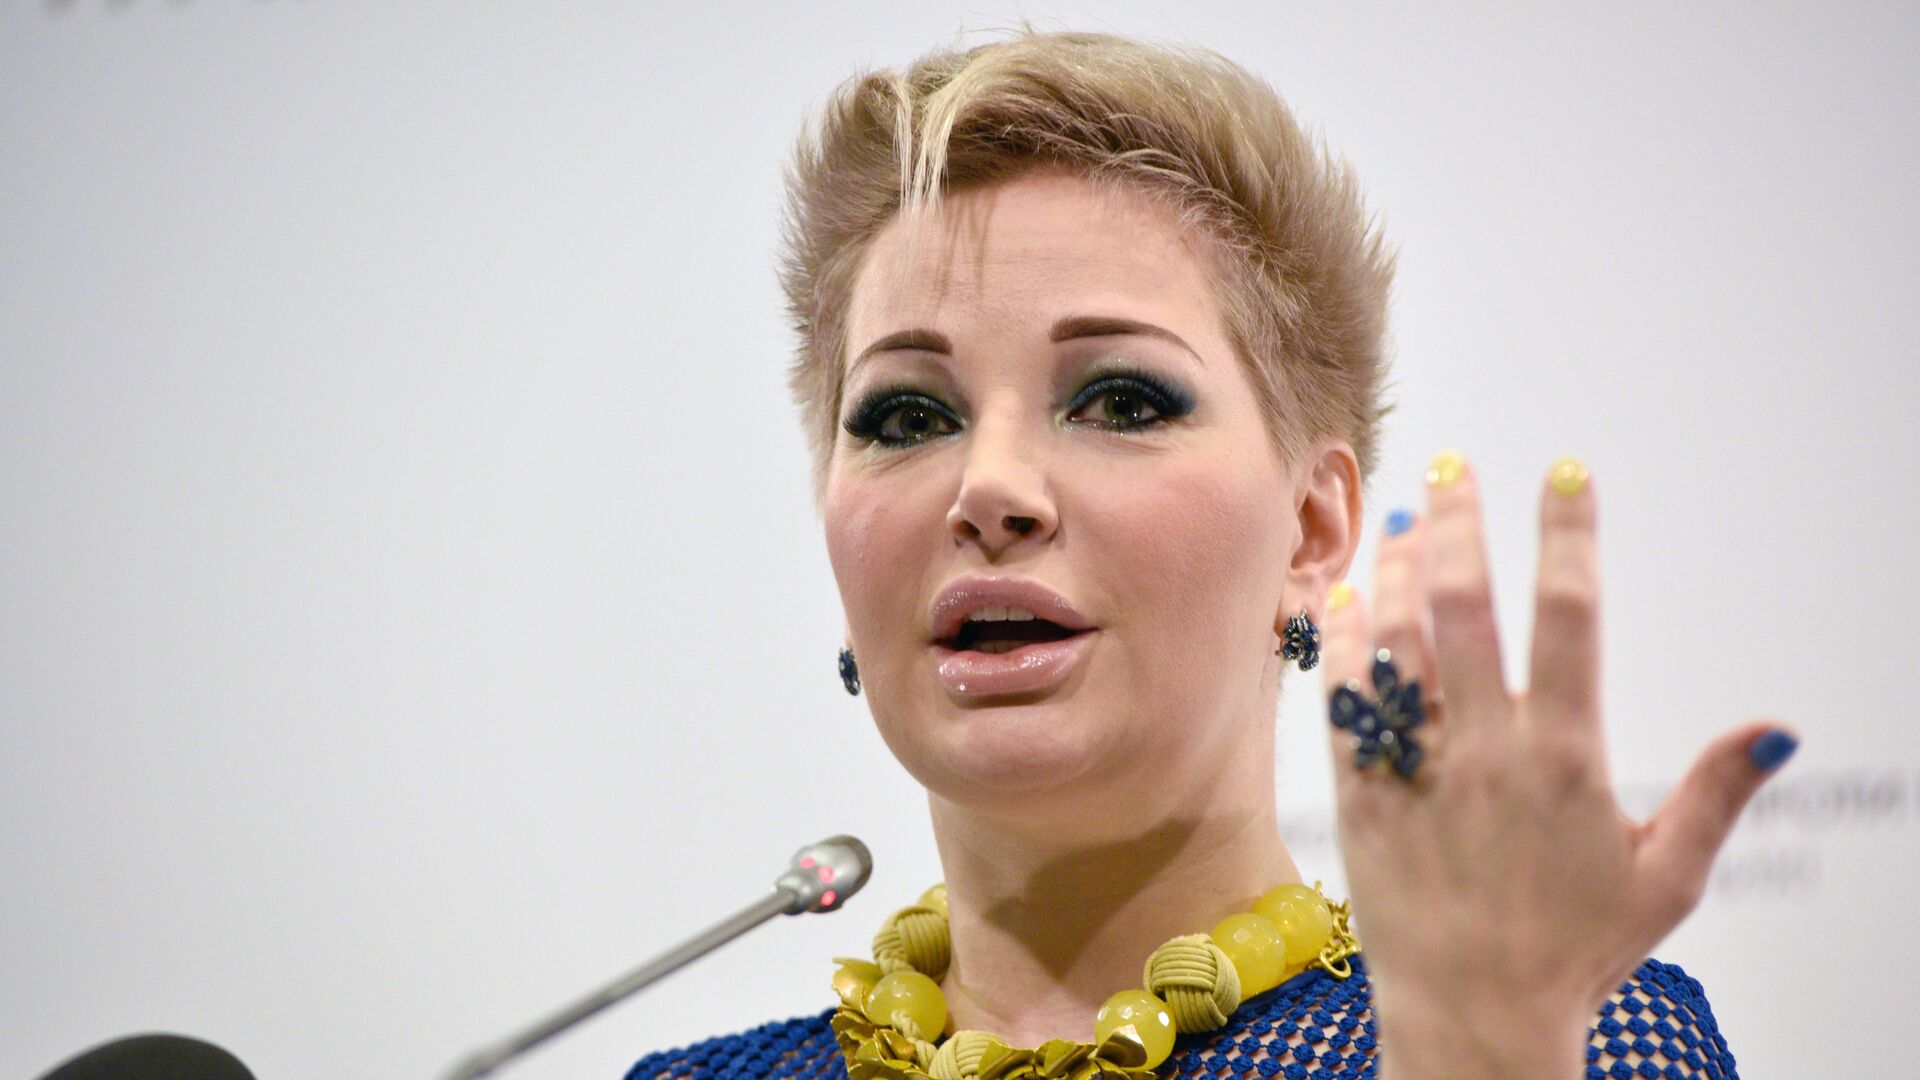 Оперная певица Мария Максакова - РИА Новости, 1920, 04.06.2021